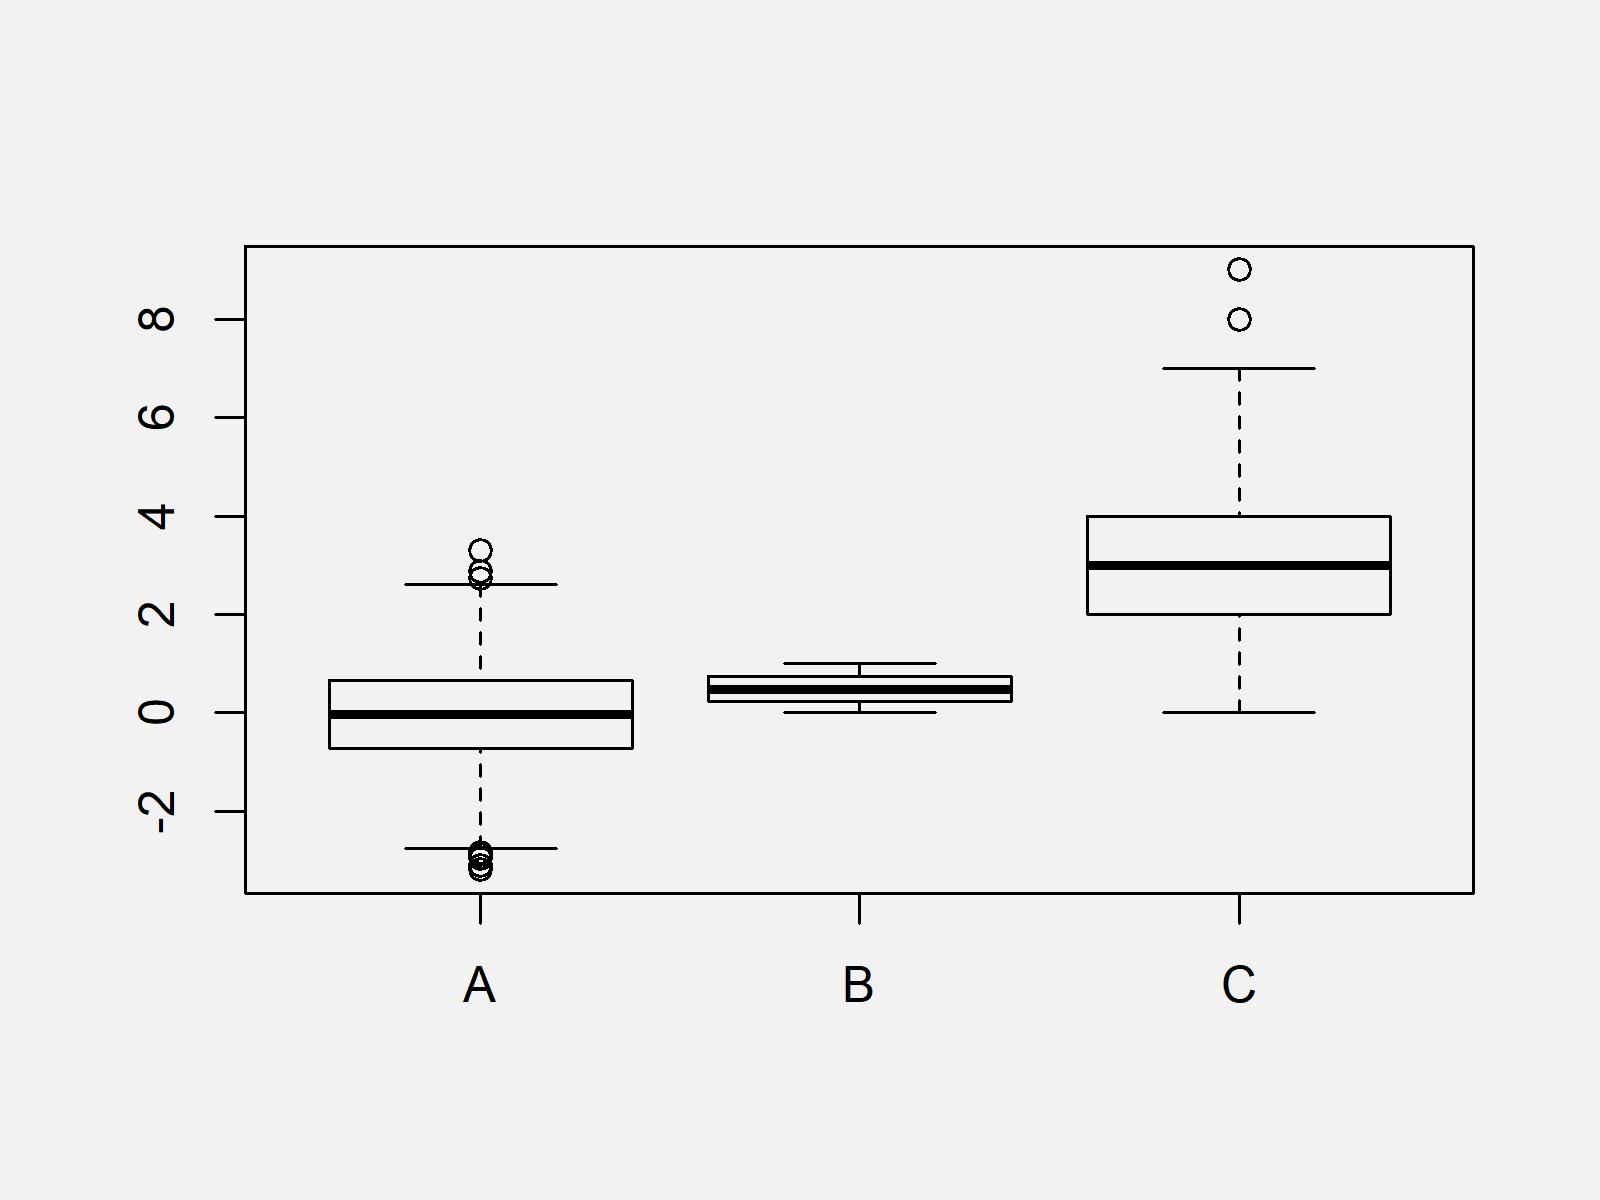 r graph figure 1 draw multiple boxplots one graph r